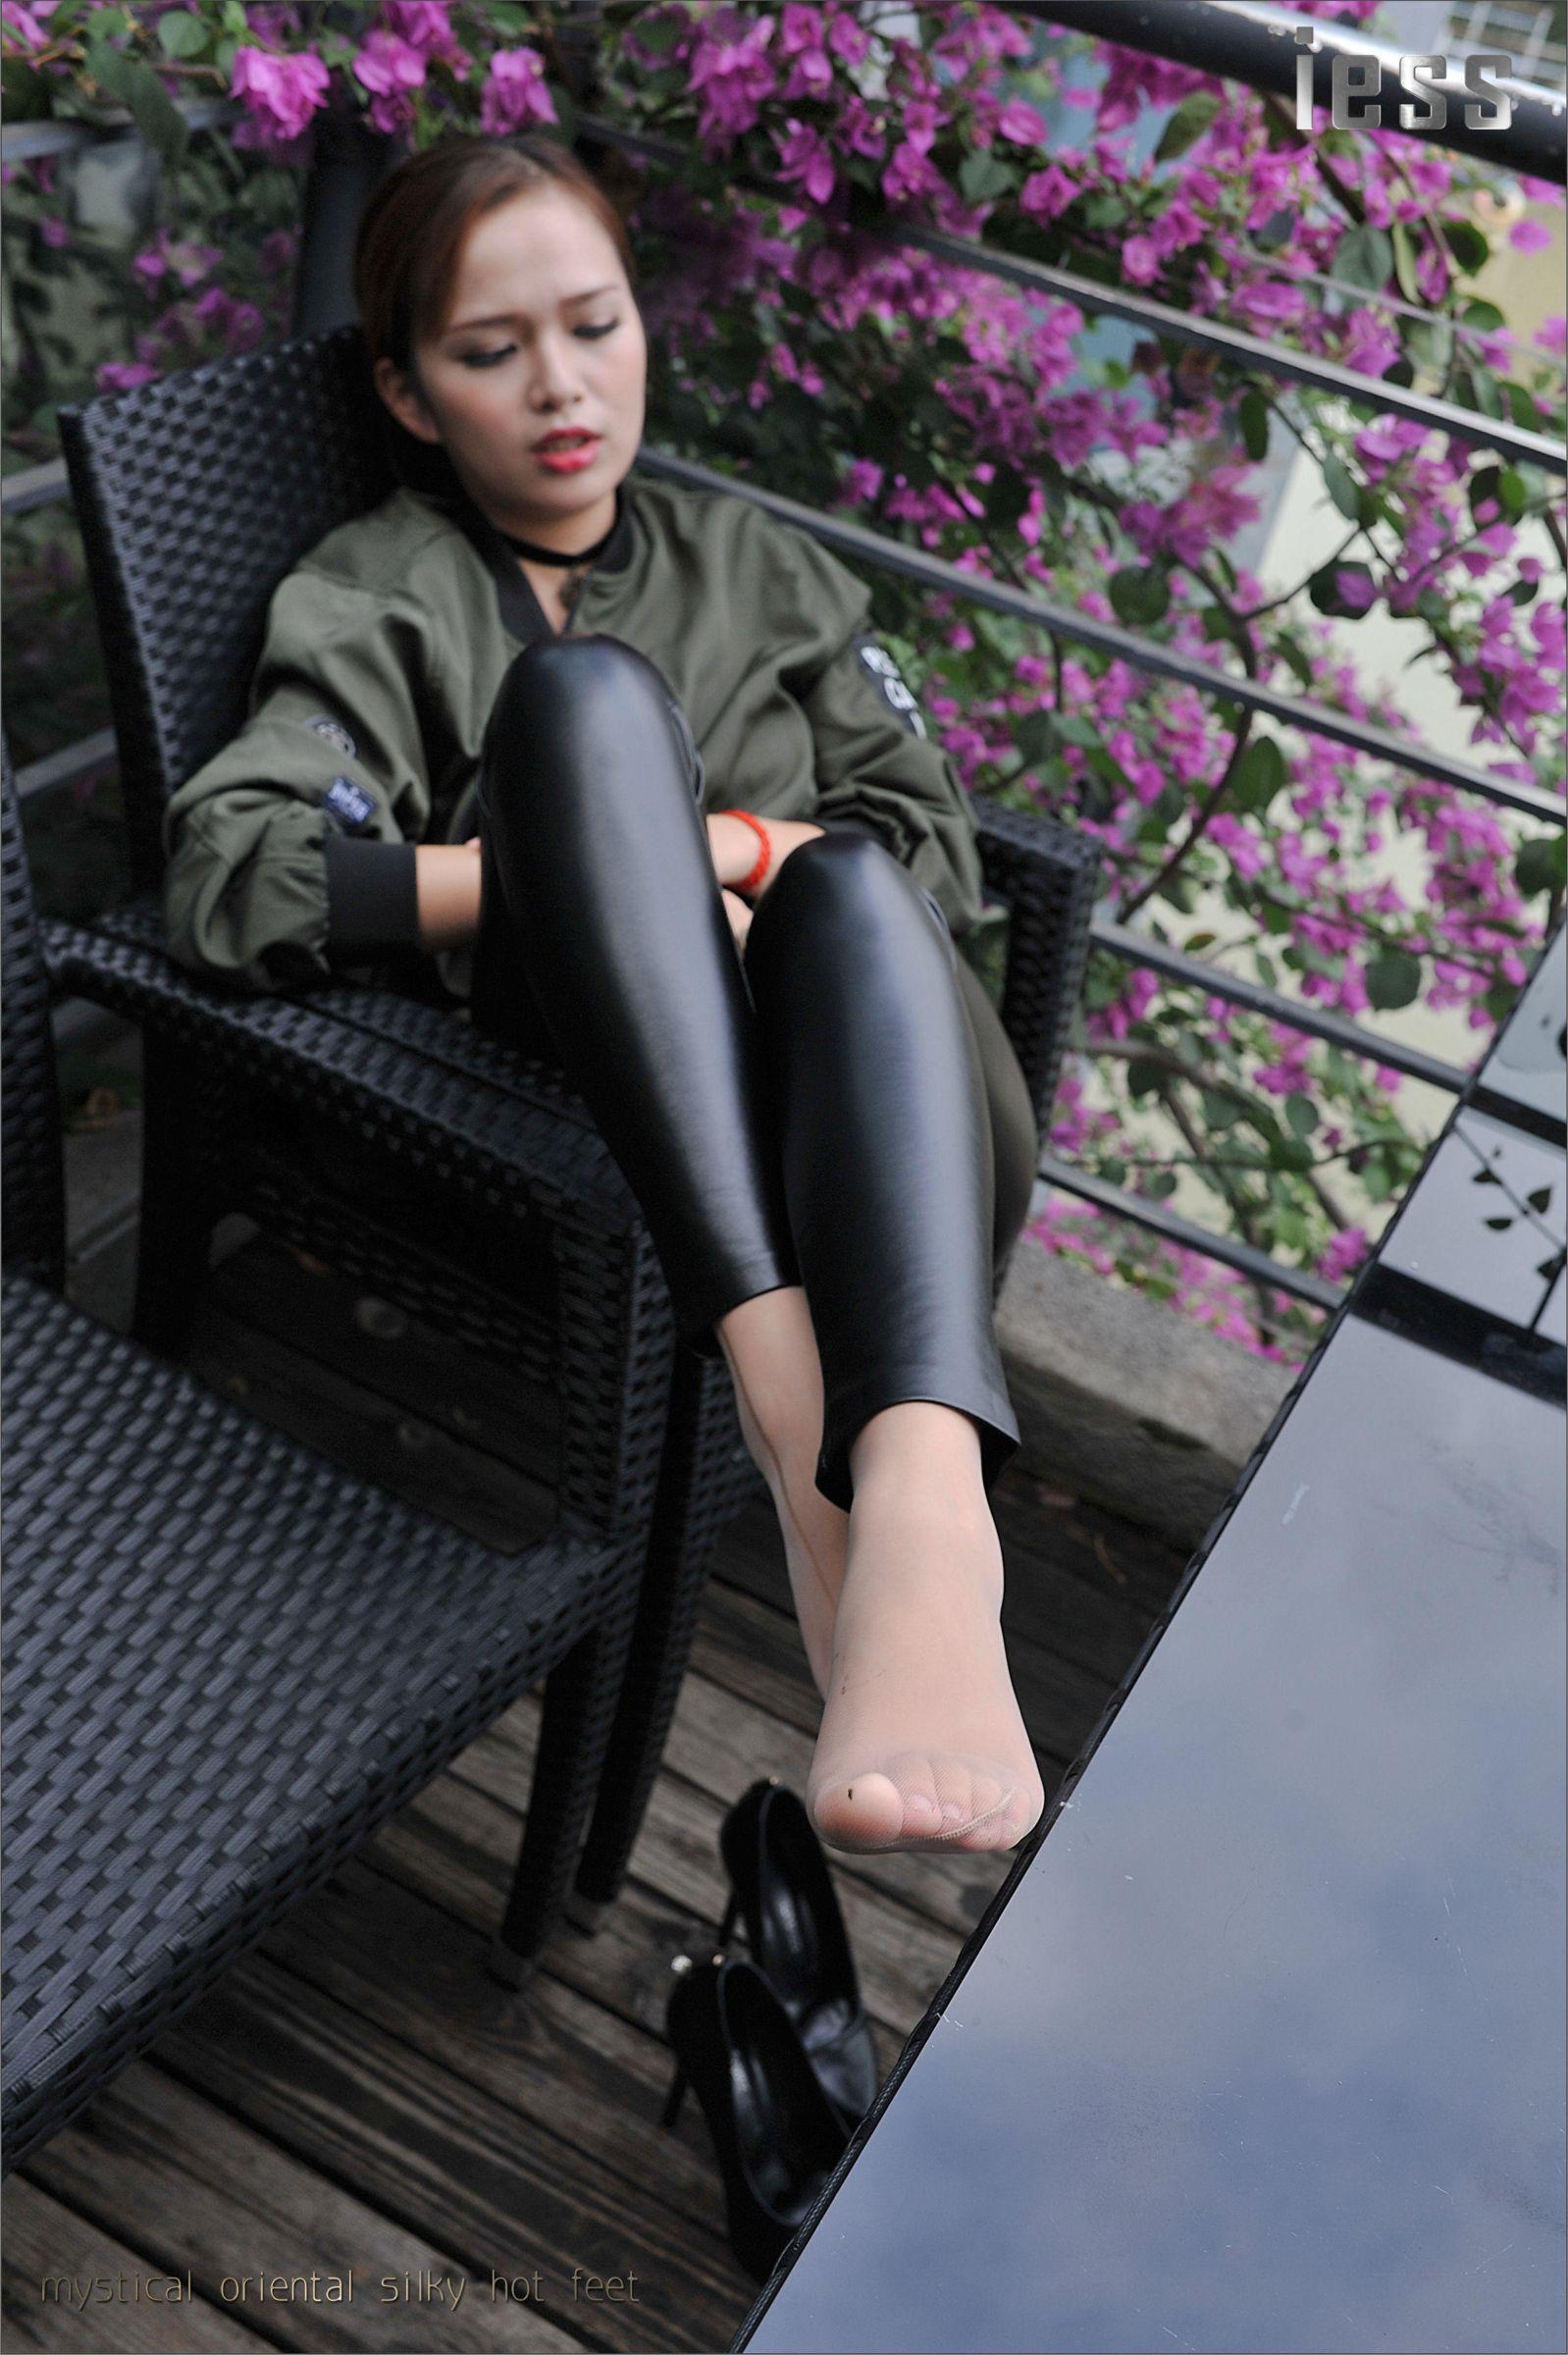 [IESS异思趣向]Model 羊羊 棕色外套加黑色紧身漆皮裤性感私房写真集